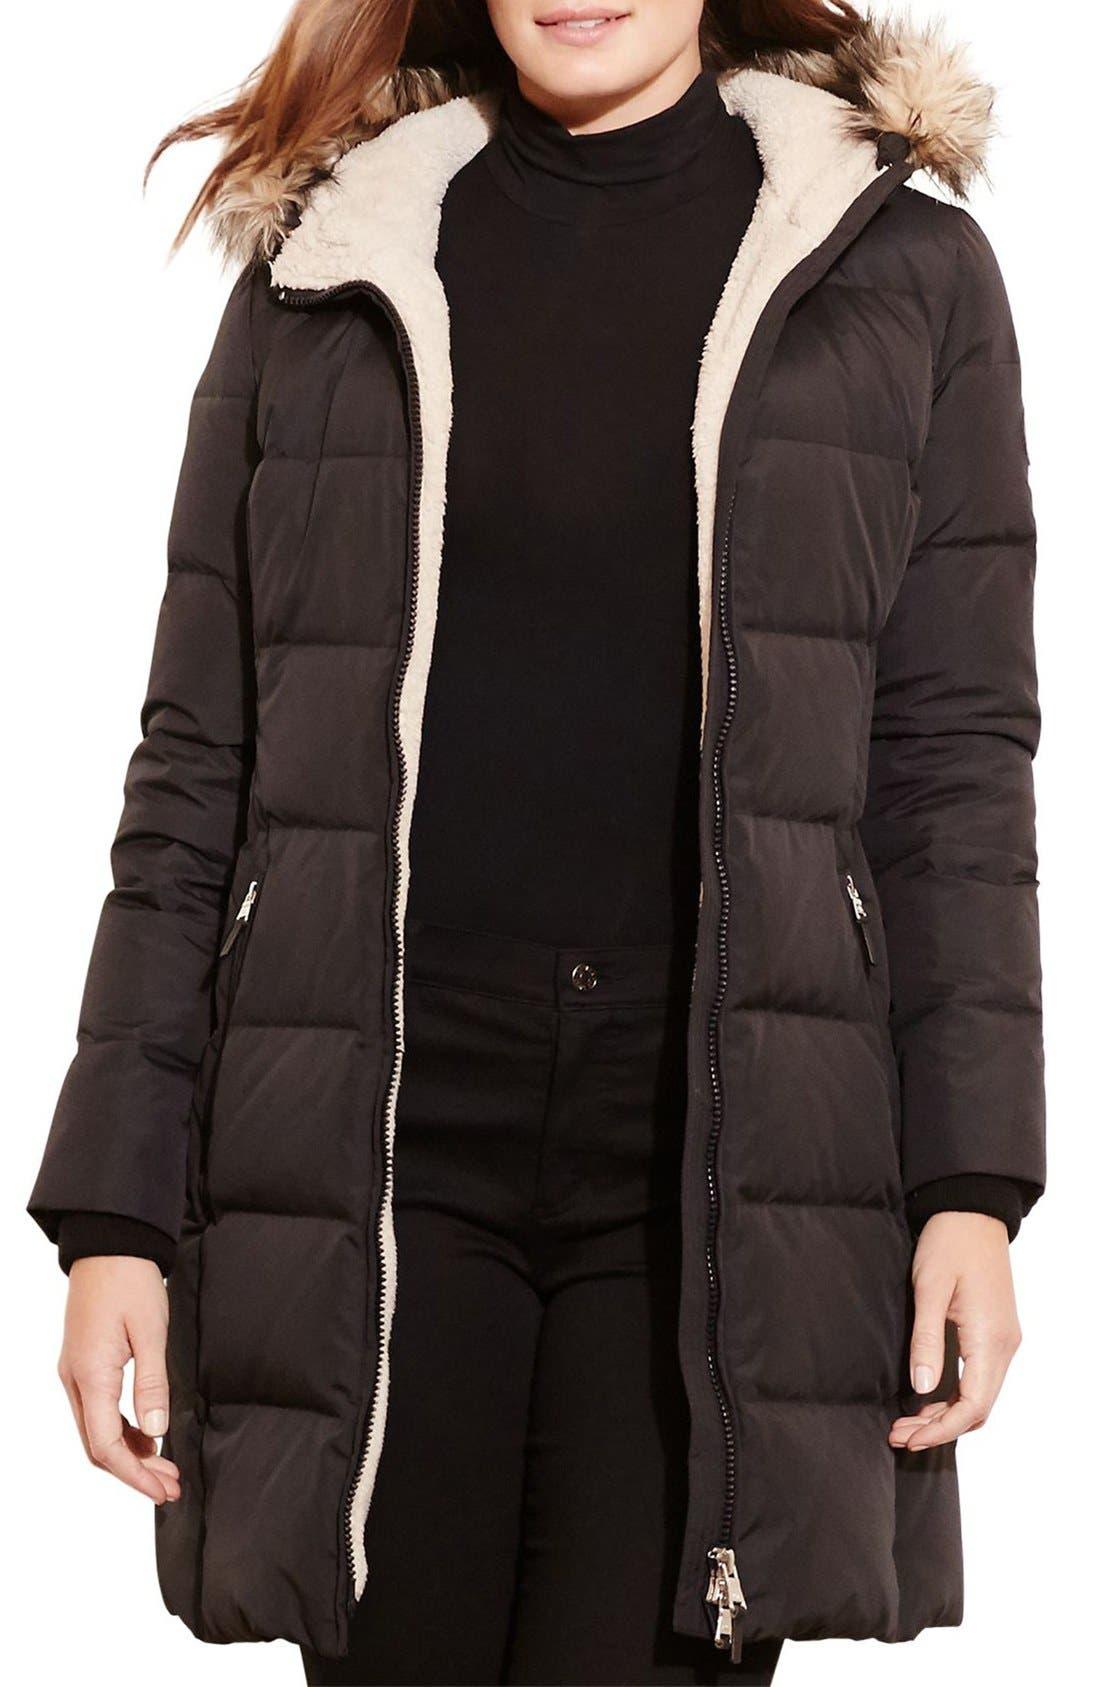 Main Image - Lauren Ralph Lauren Quilted Down & Feather Fill Parka with Faux Fur Trim (Plus Size)